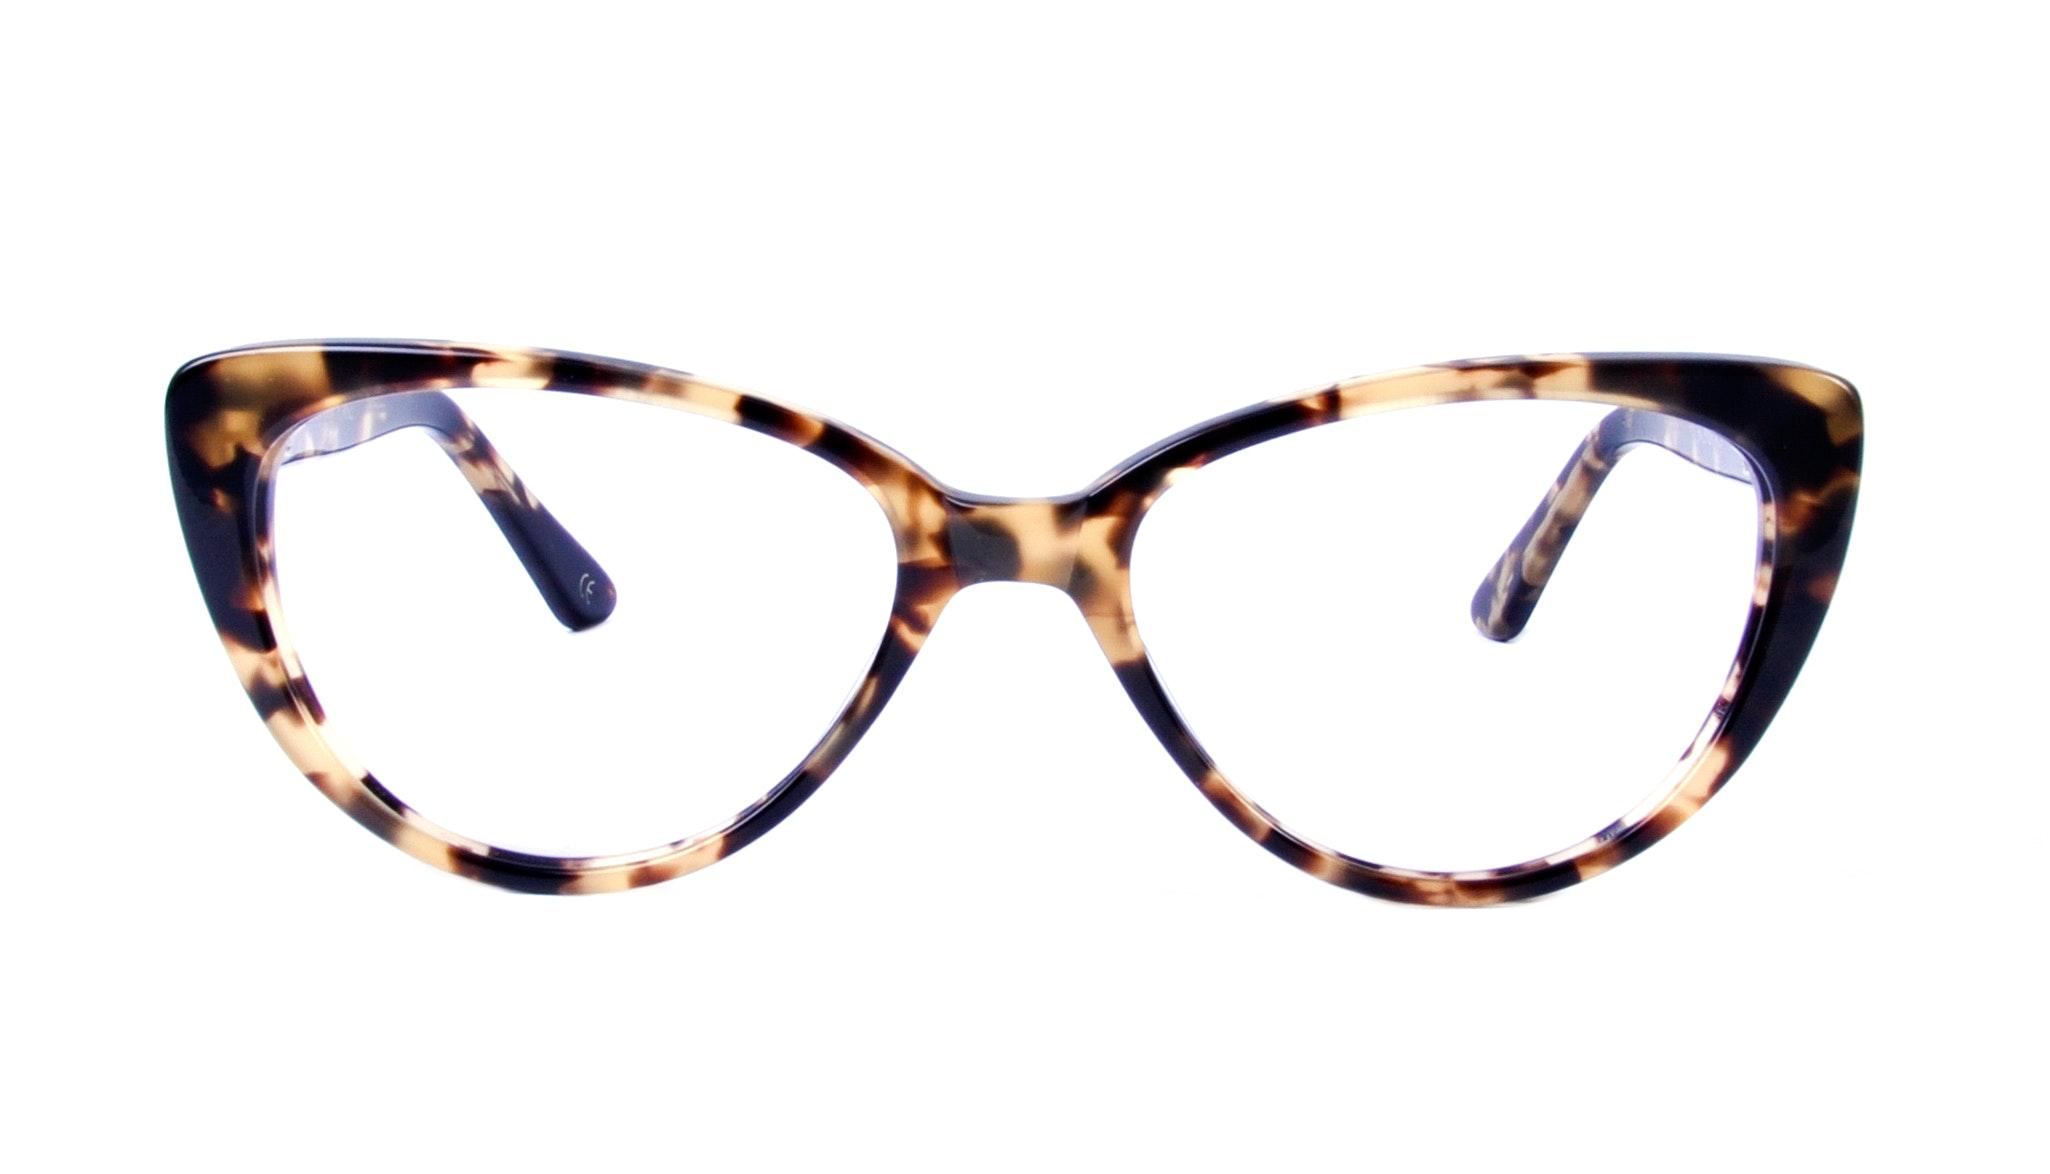 Affordable Fashion Glasses Round Eyeglasses Women Coco Dark Tortoise Front